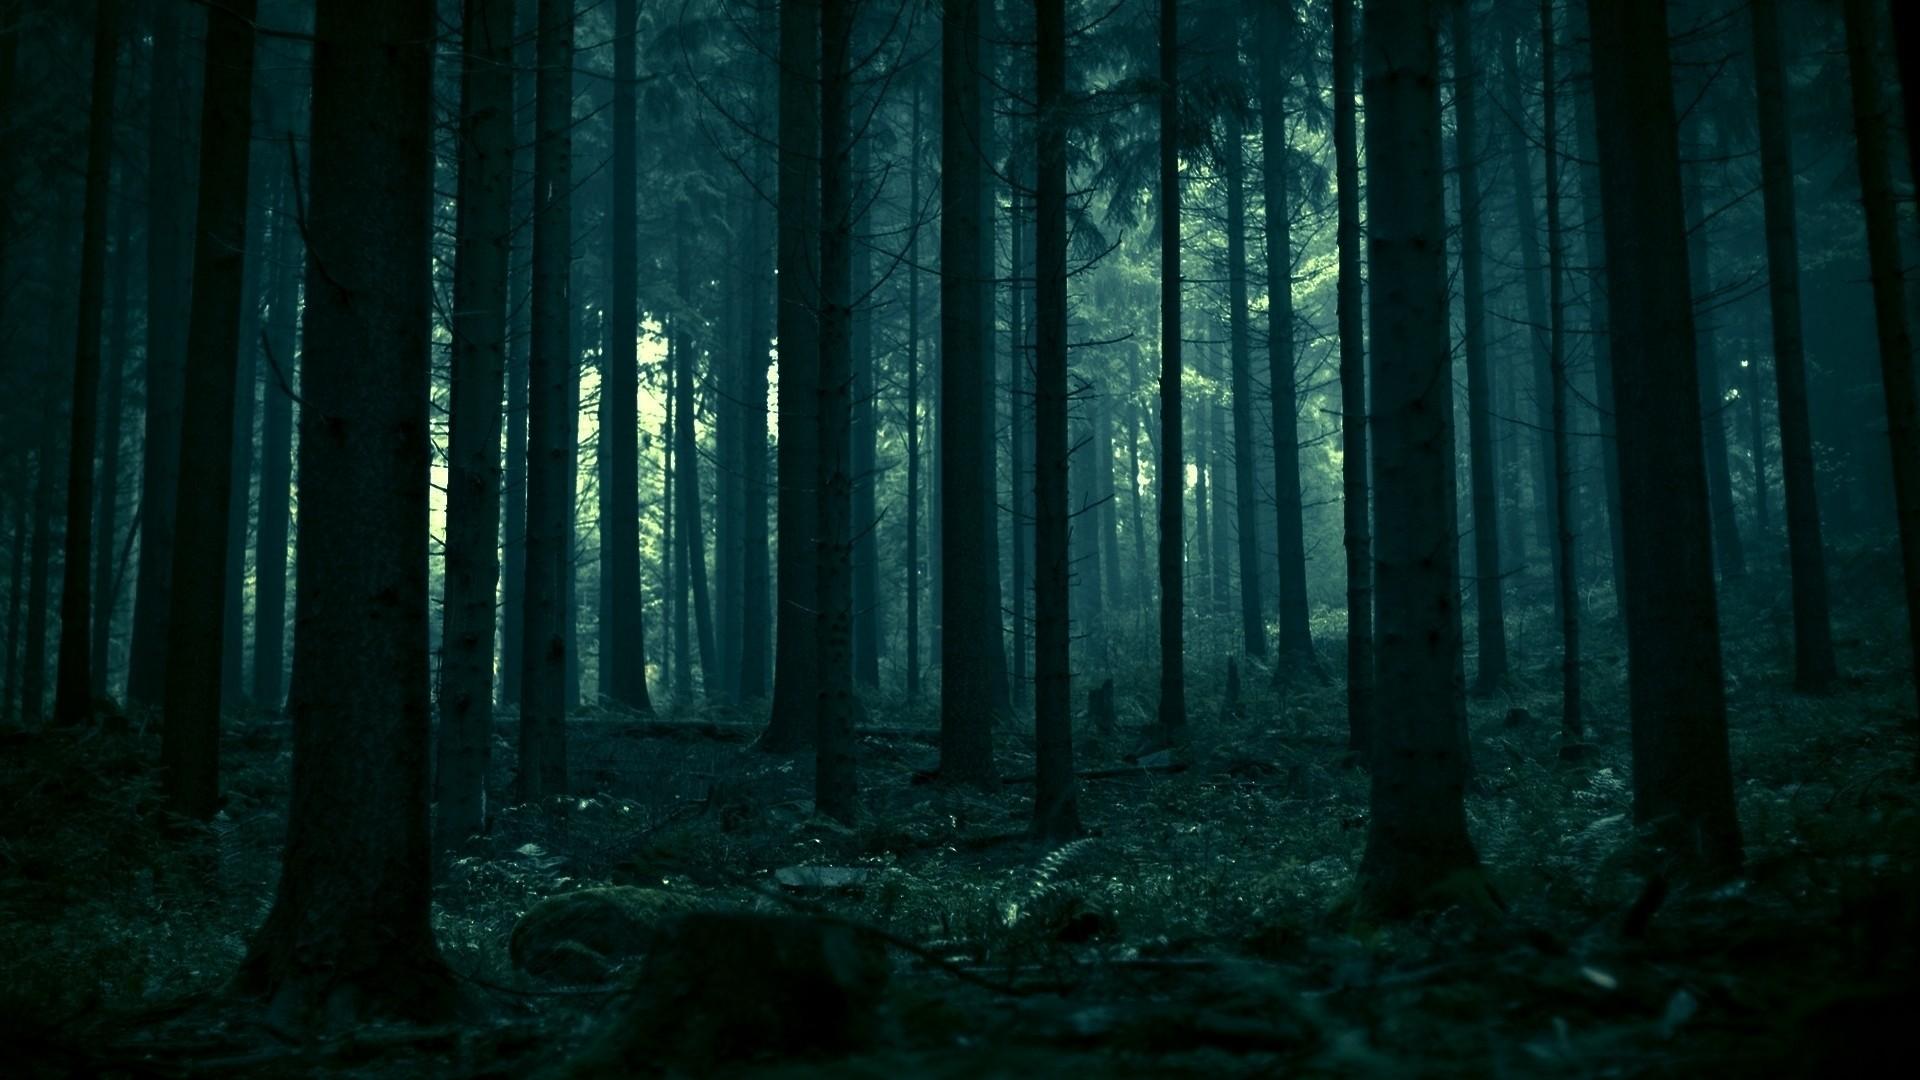 dark forest 12902 wallpapers hd ref- background tenebroso